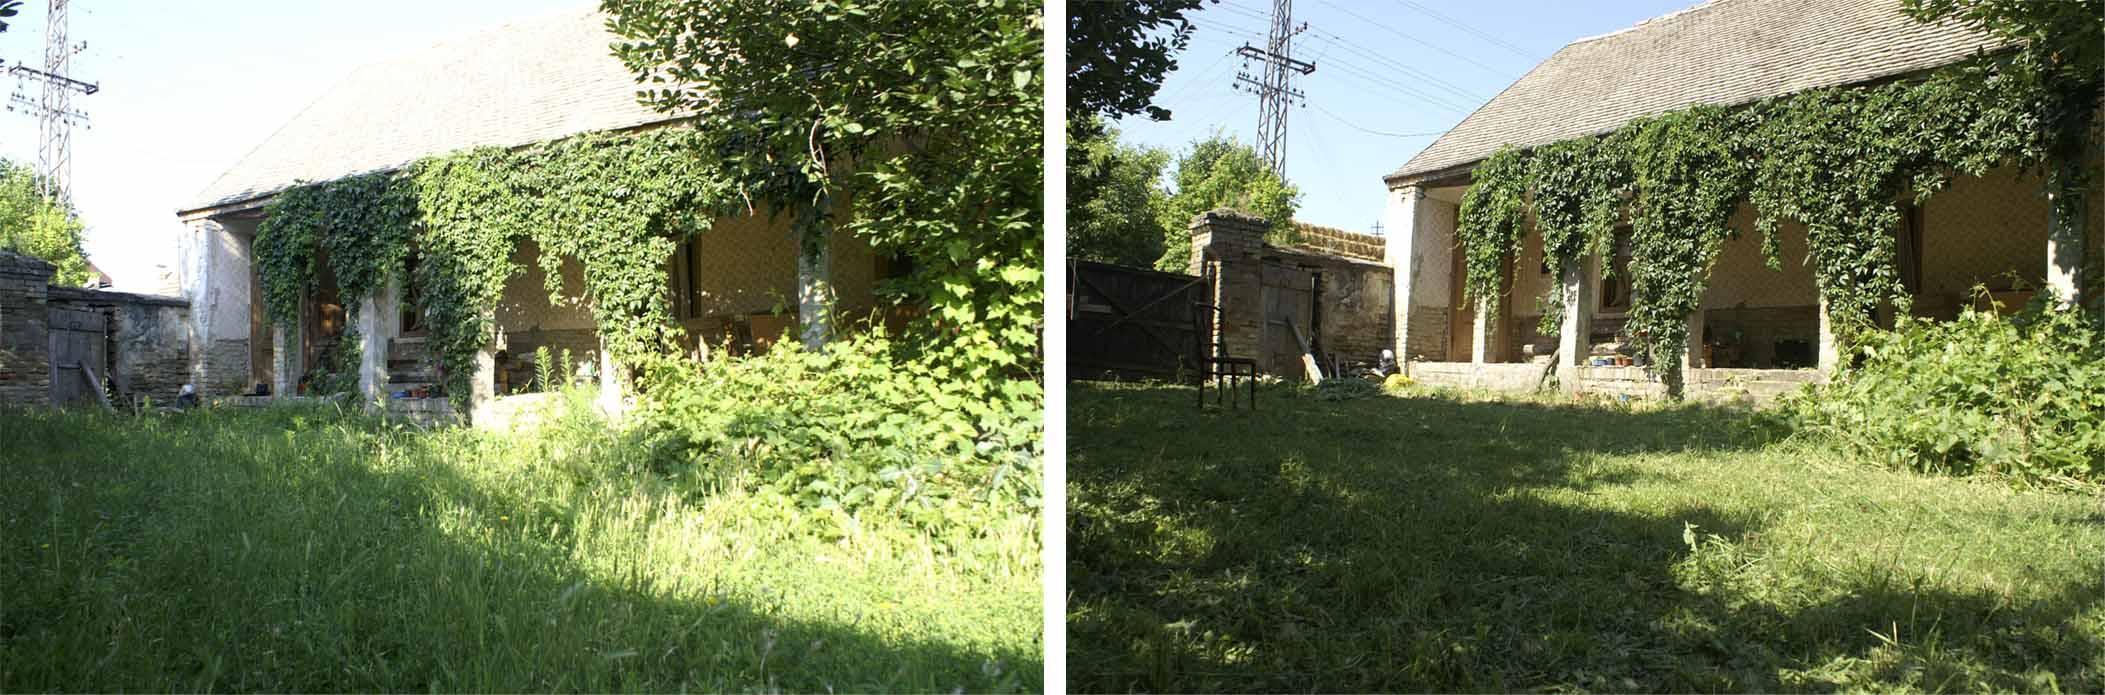 08 pre i posle dzungle